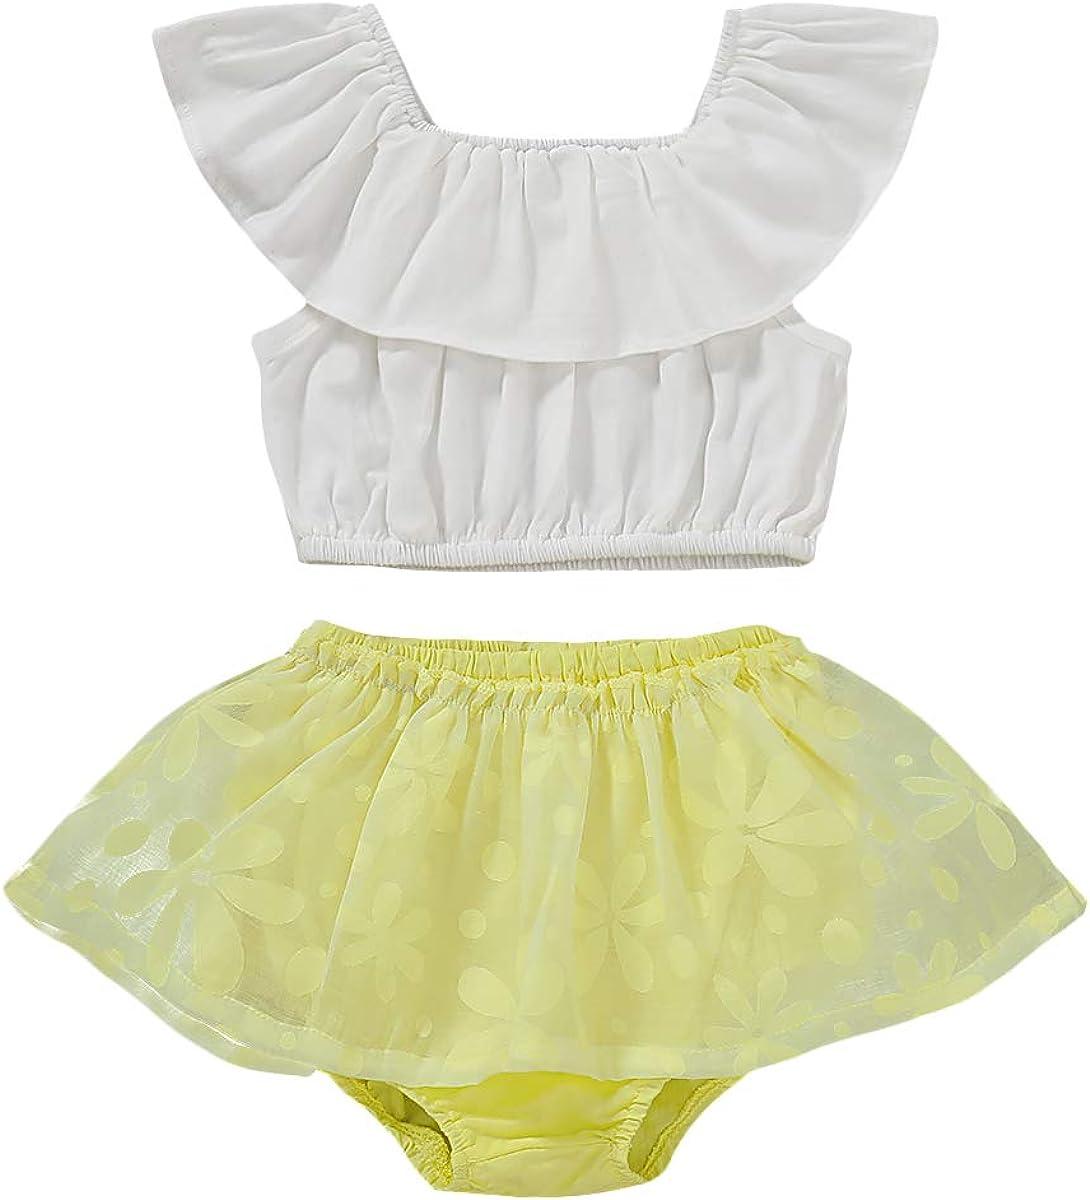 Toddler Baby Girls Clothes Skirt Set Ruffle Off-Shoulder Sleeve+Skirt Outfit Summer Short Set Clothing